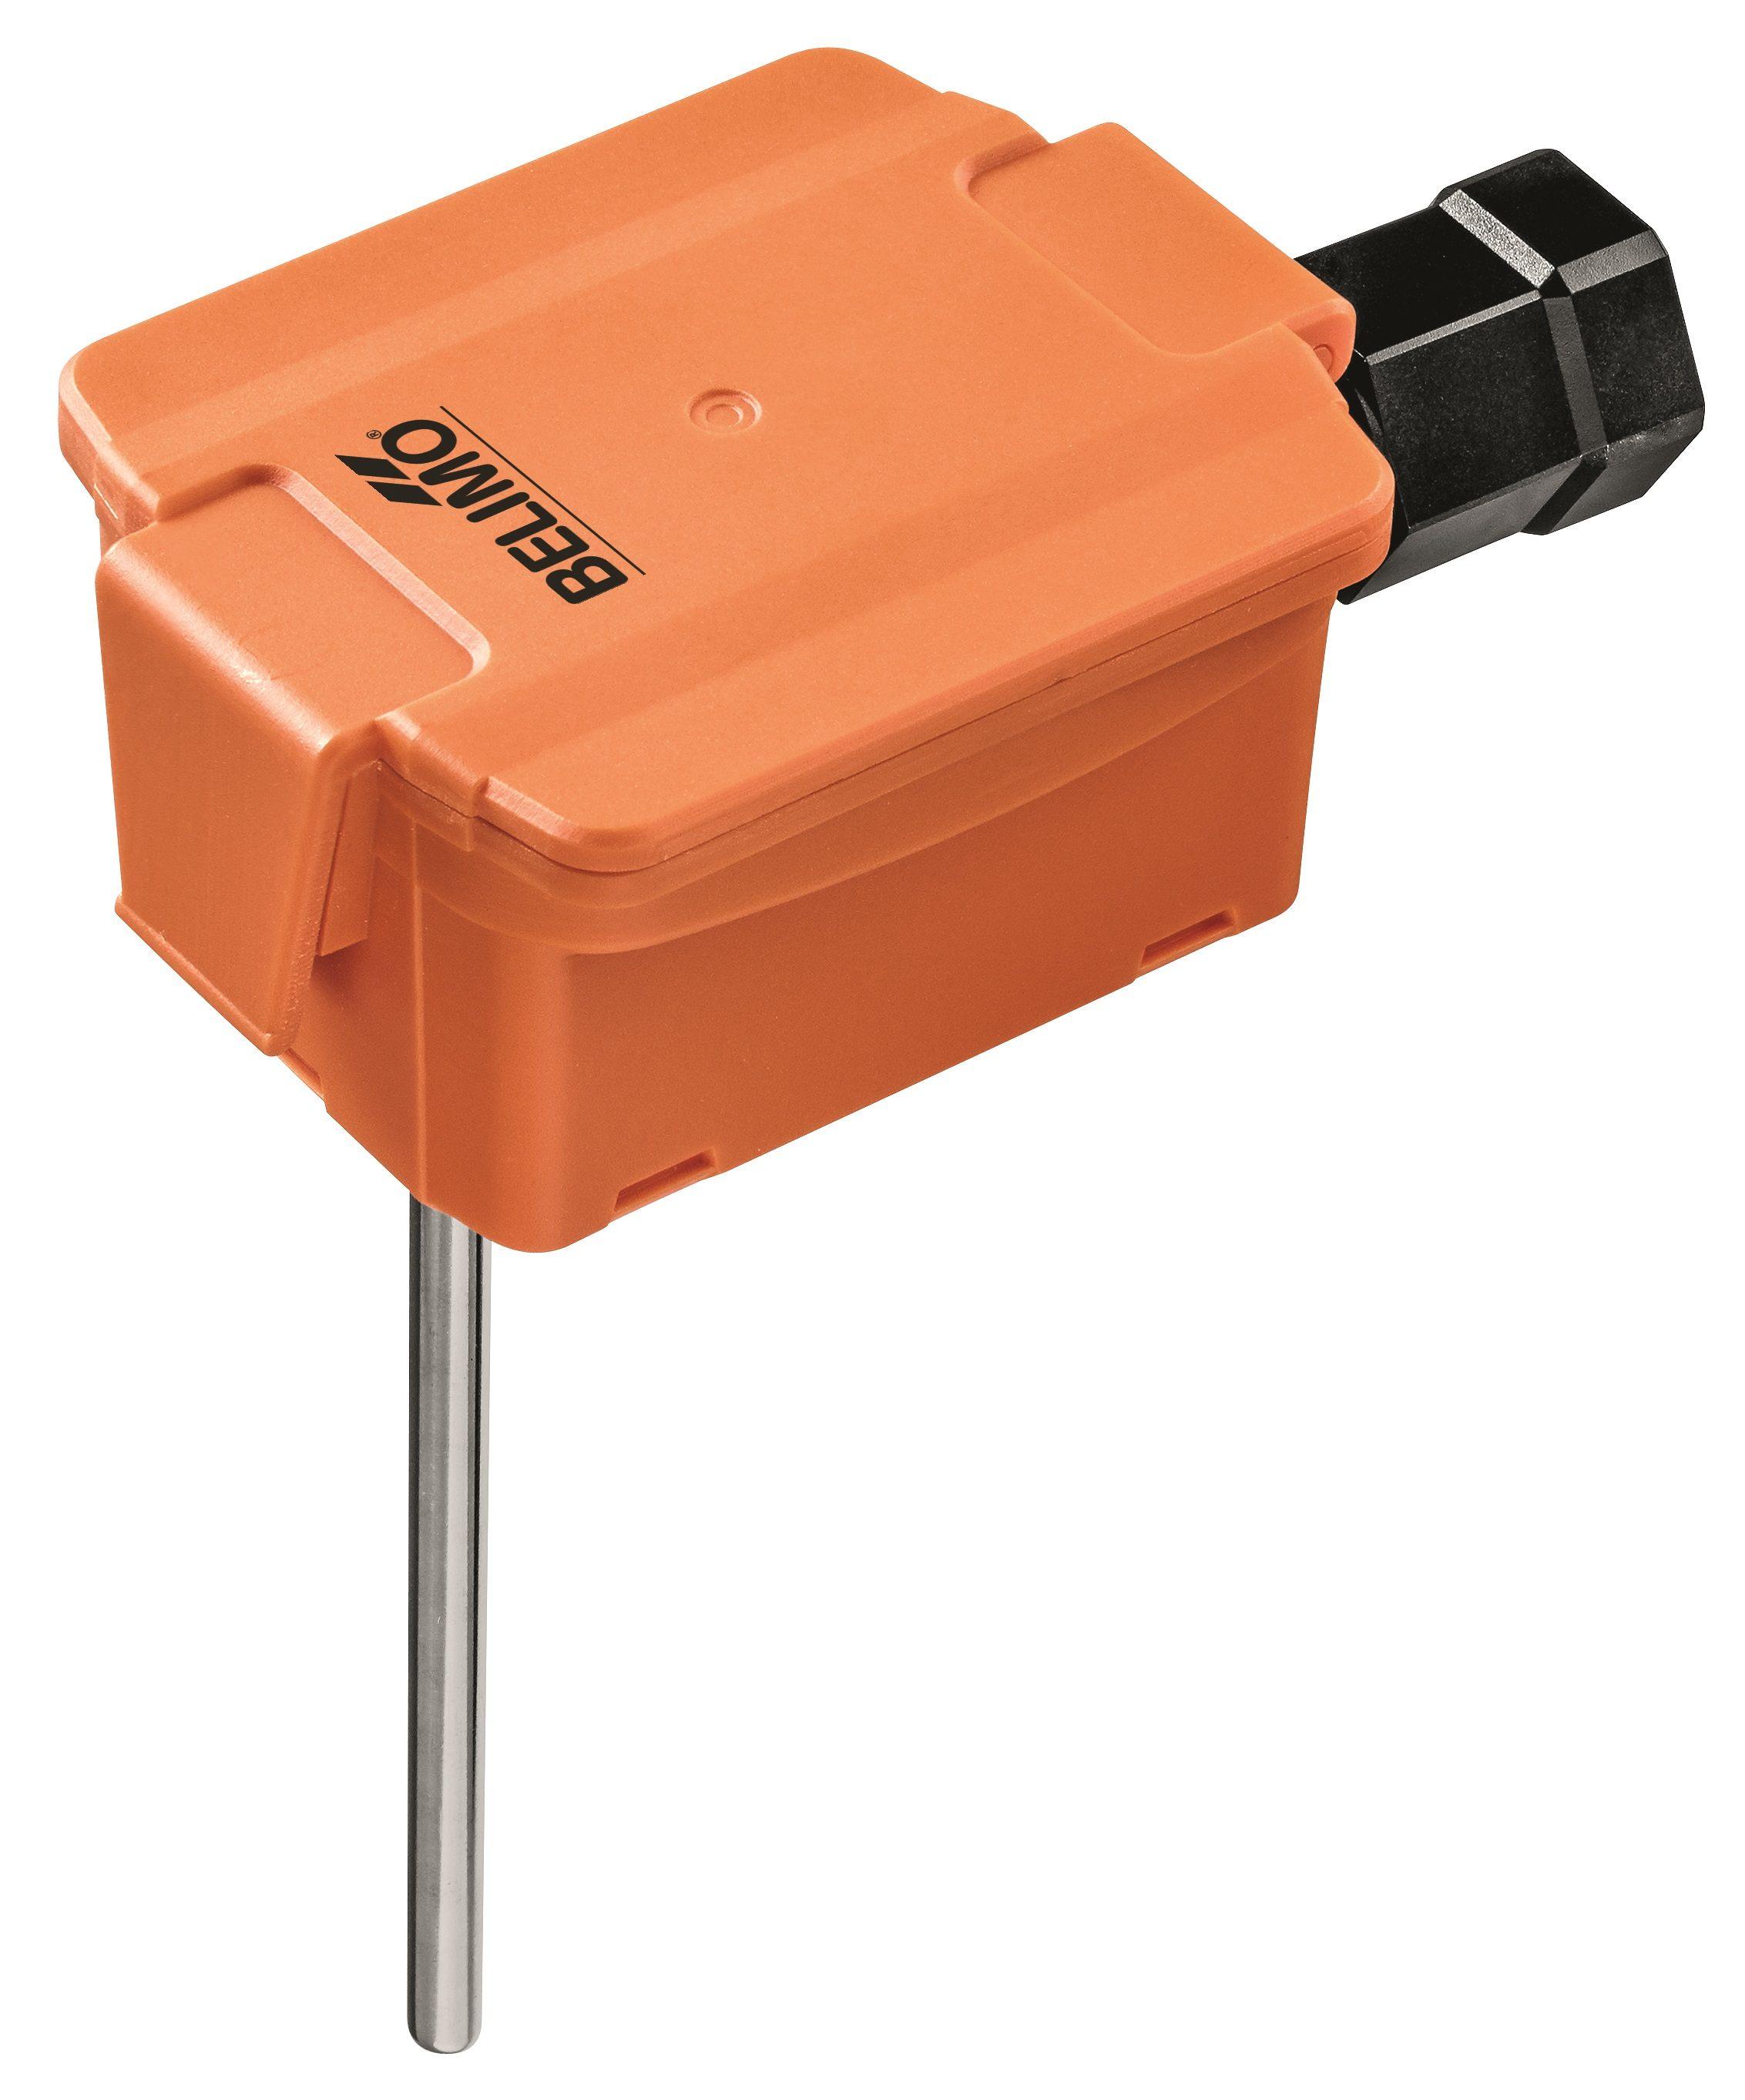 Belimo Belimo HVAC Sensors (2017) 01DT-5BH Sensors